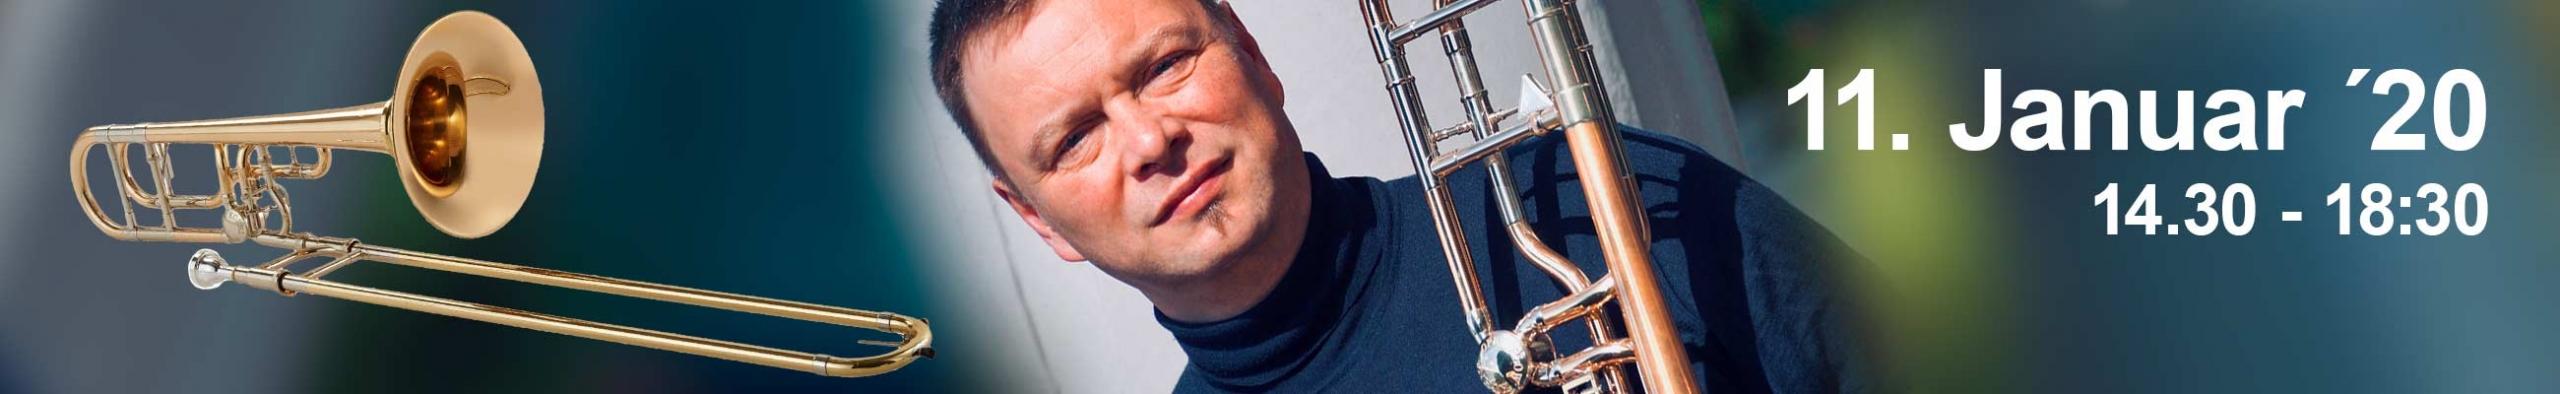 Edgar Manyak Workshop im Musikhaus Beck